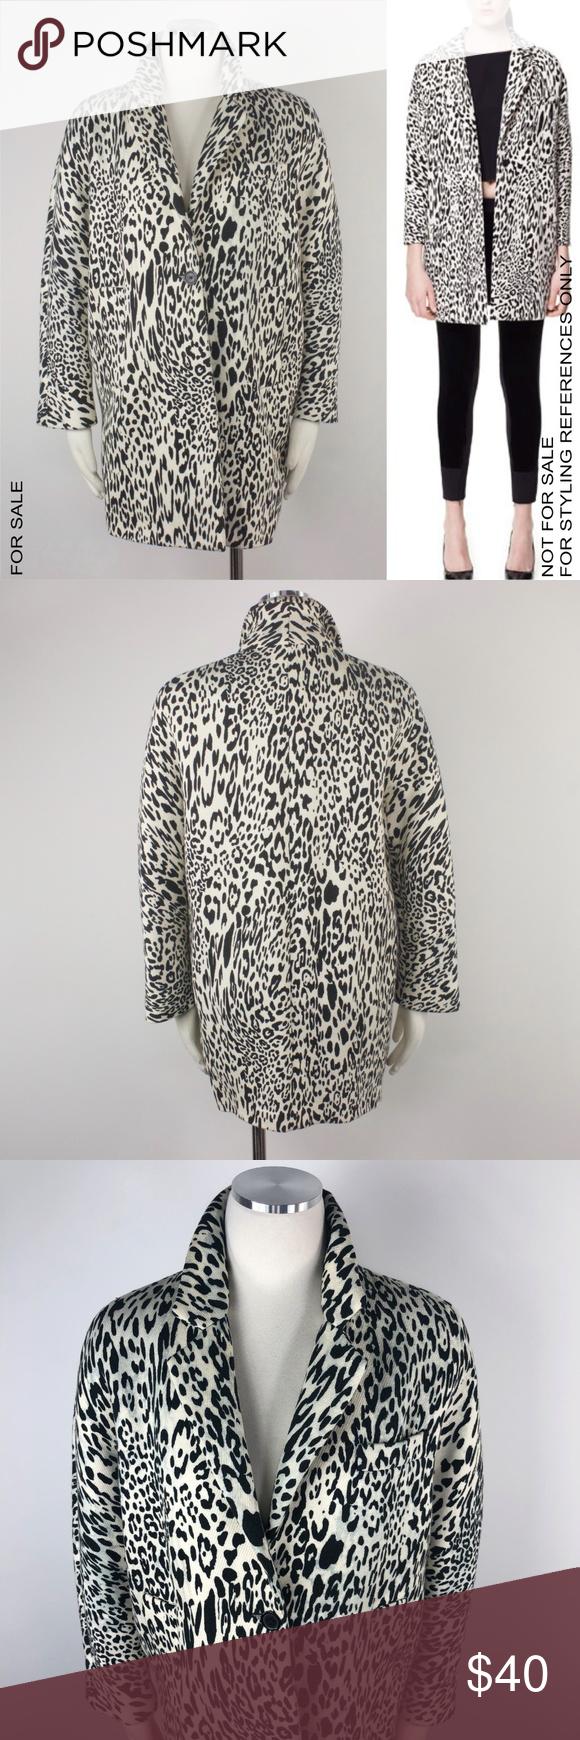 d44eea35ad9c Zara White Leopard Print Oversize Car Coat Black M Zara Women's Jacket  Cotton White Leopard Cheetah Print Blazer Black Beige Car Oversized Long  Sleeve ...